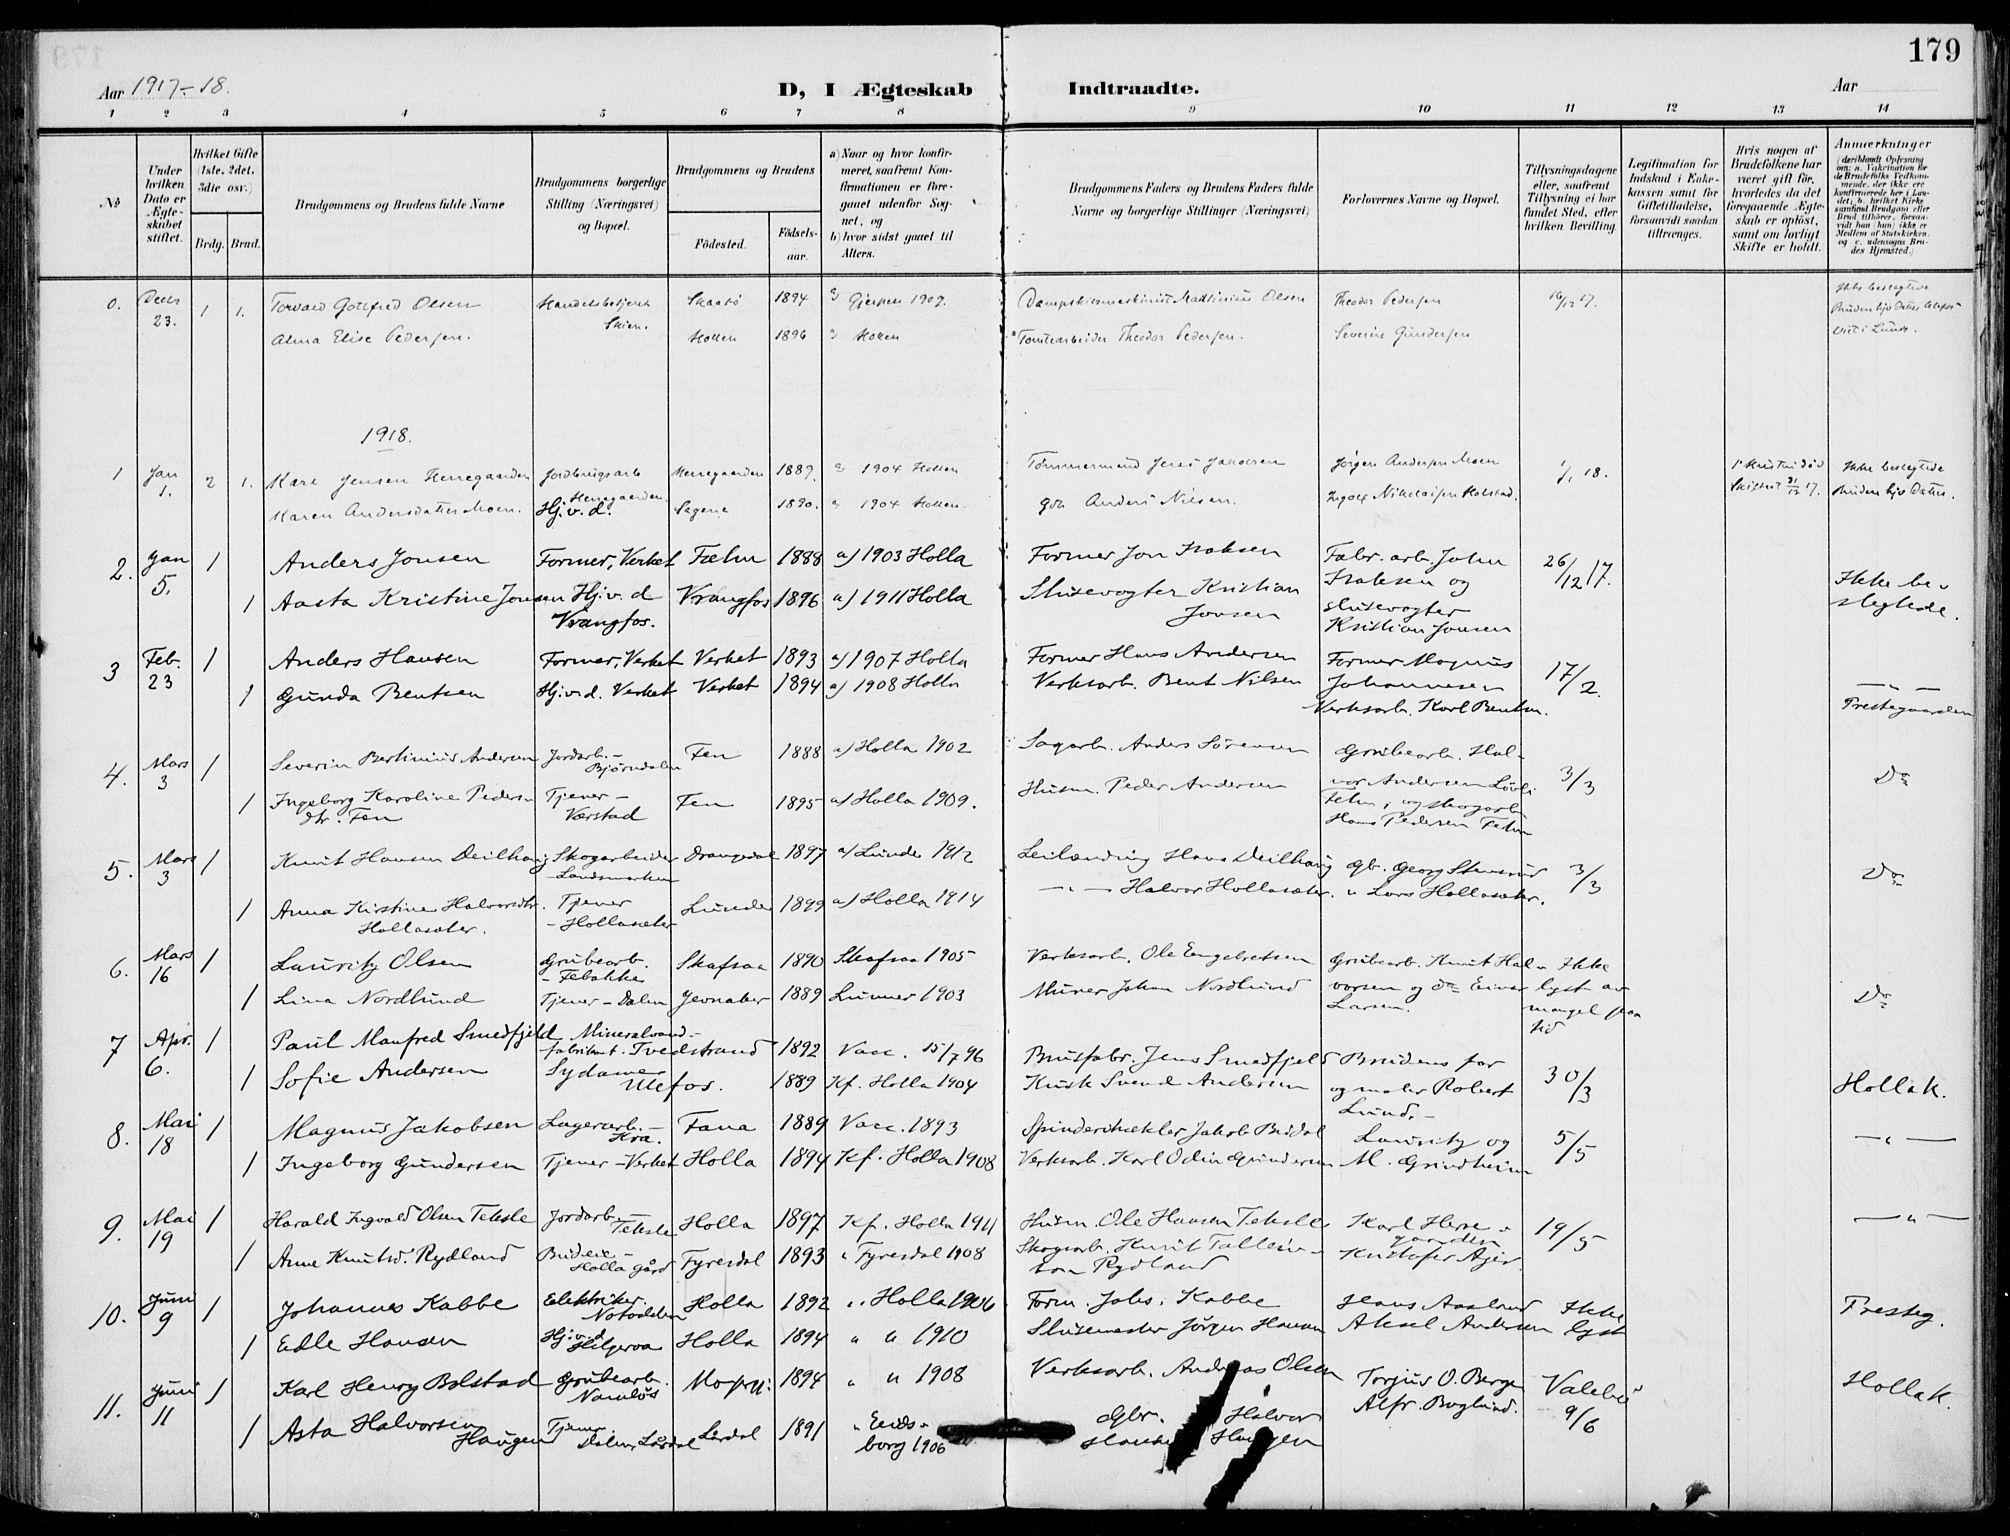 SAKO, Holla kirkebøker, F/Fa/L0012: Ministerialbok nr. 12, 1907-1923, s. 179